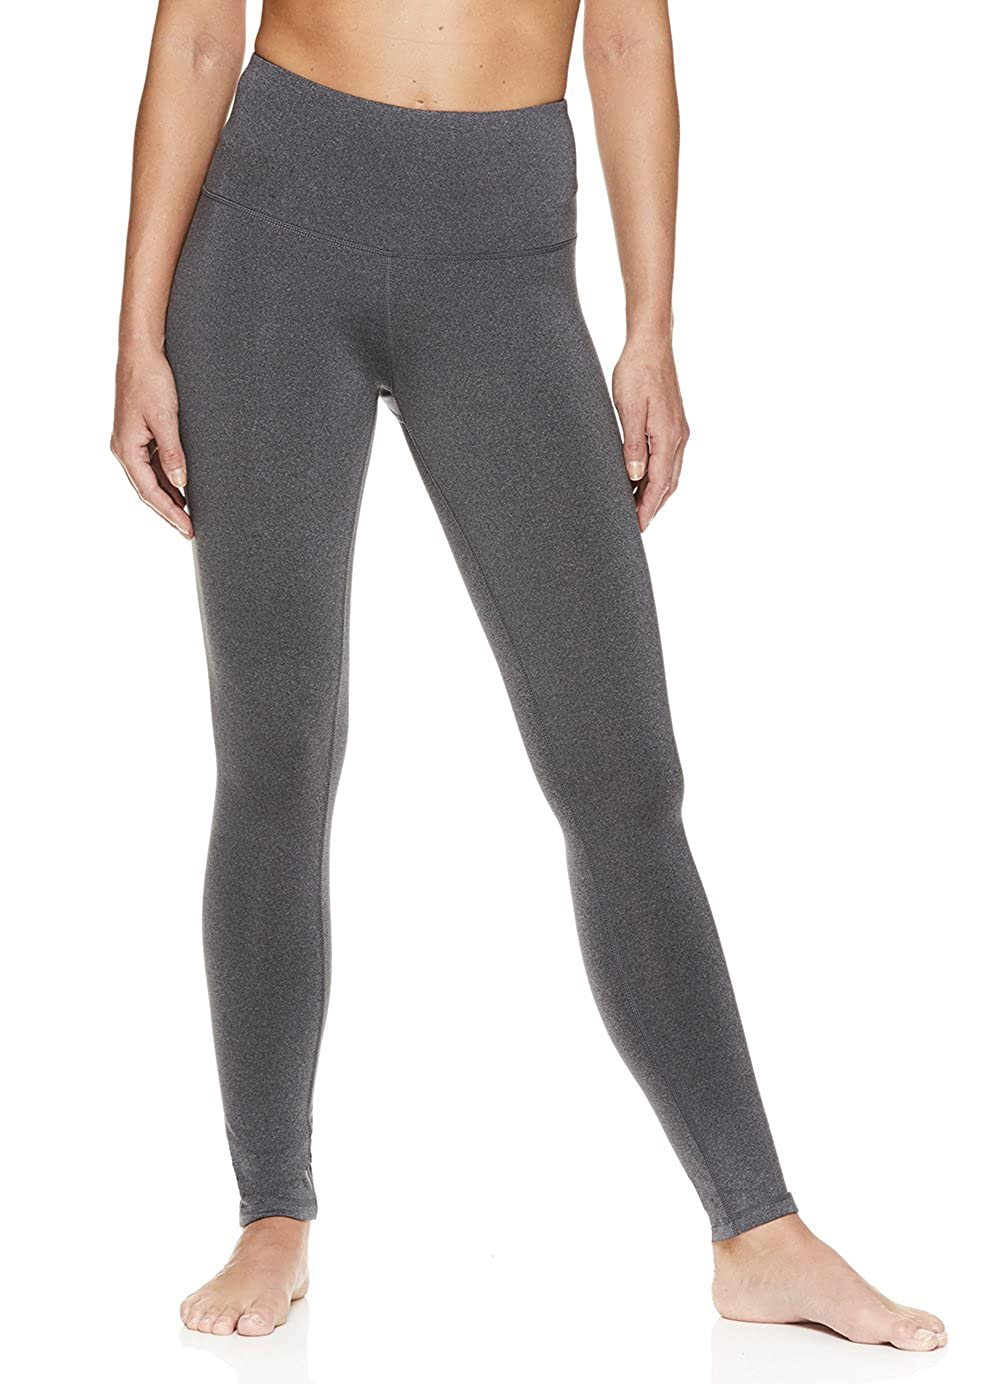 f743ecc4e49 Amazon.com  Reebok Women s High Rise Leggings Performance Compression Pants   Sports   Outdoors